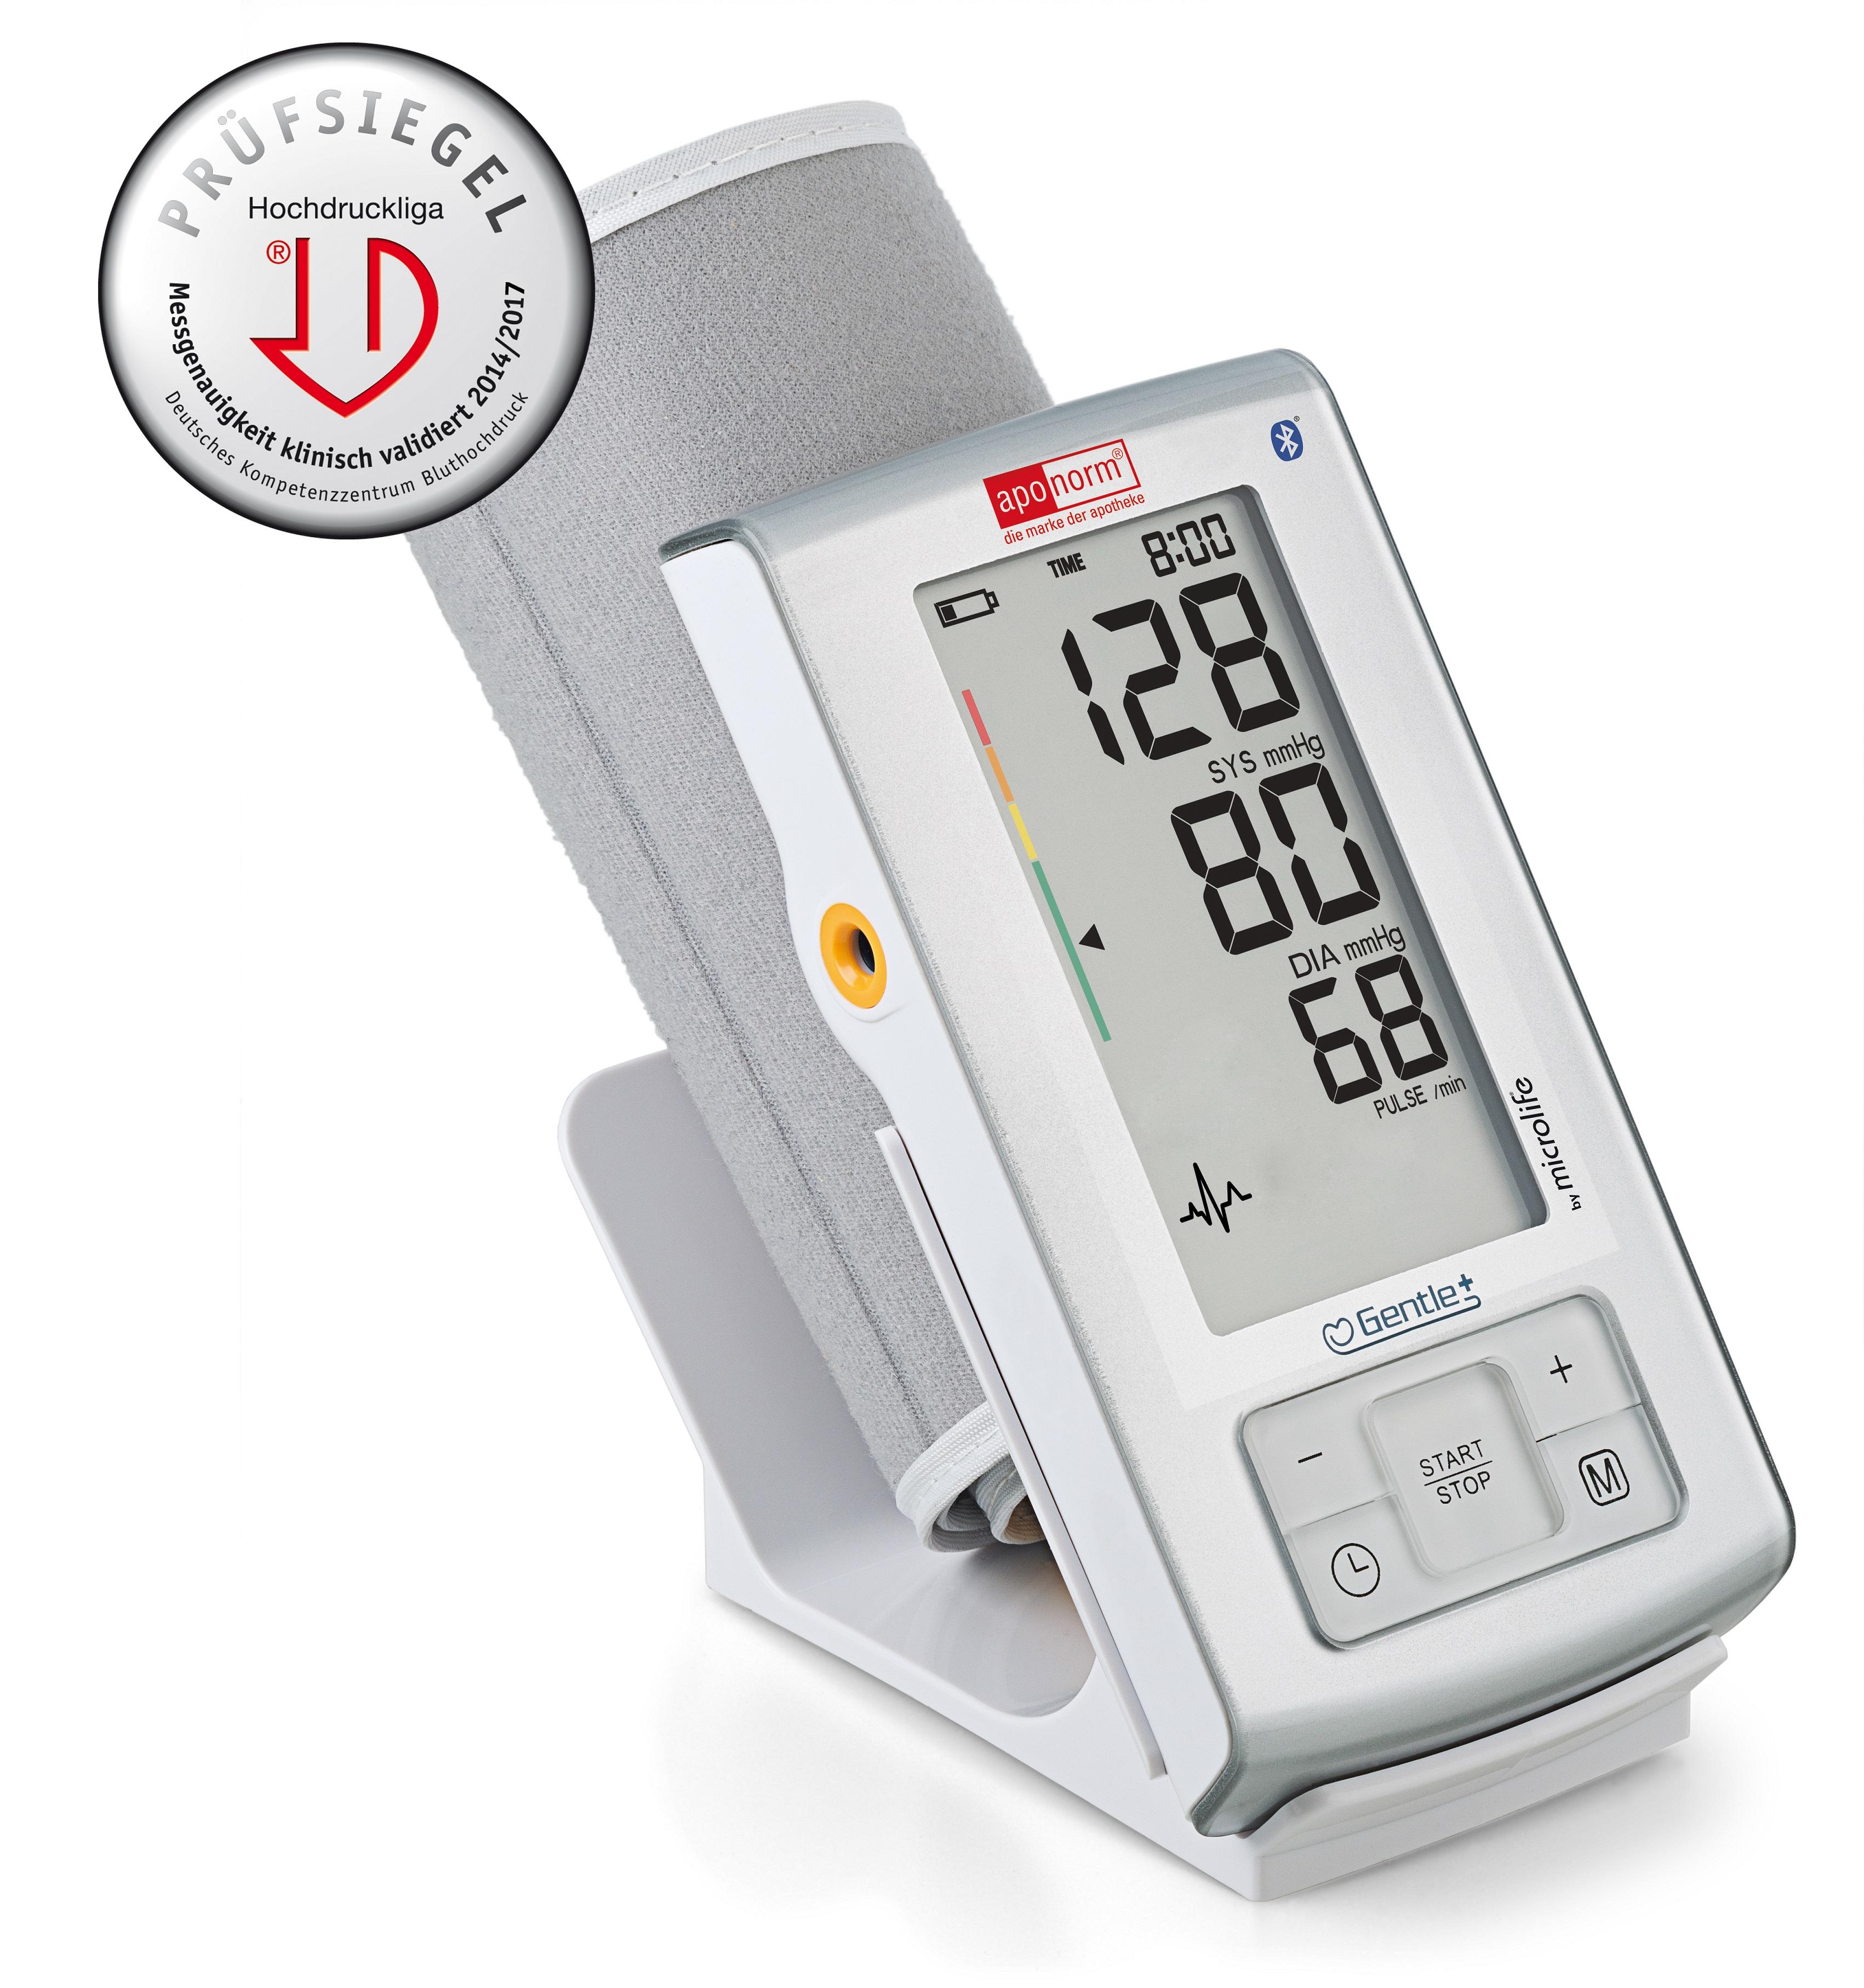 aponorm® Basis Plus Bluetooth Blutdruckmessgerät